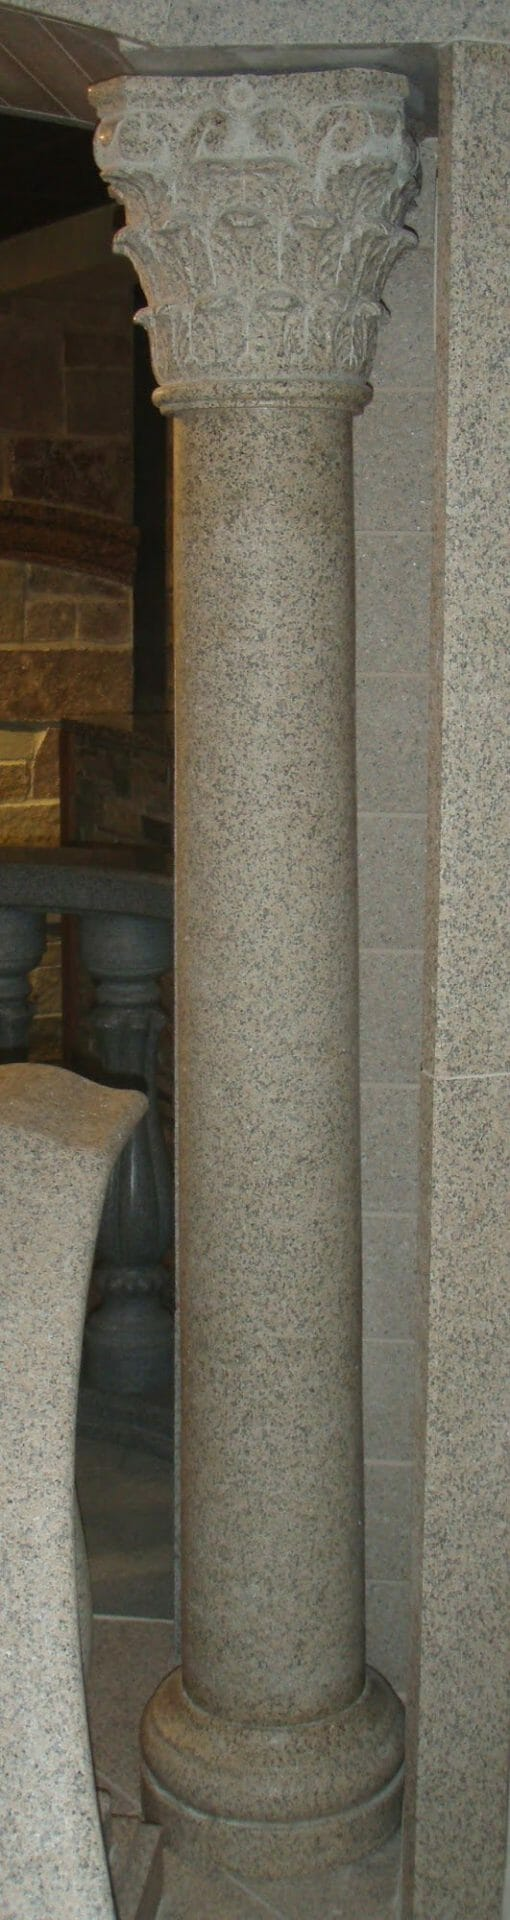 Giallo Fantasia Dark Granite Corinthian Column